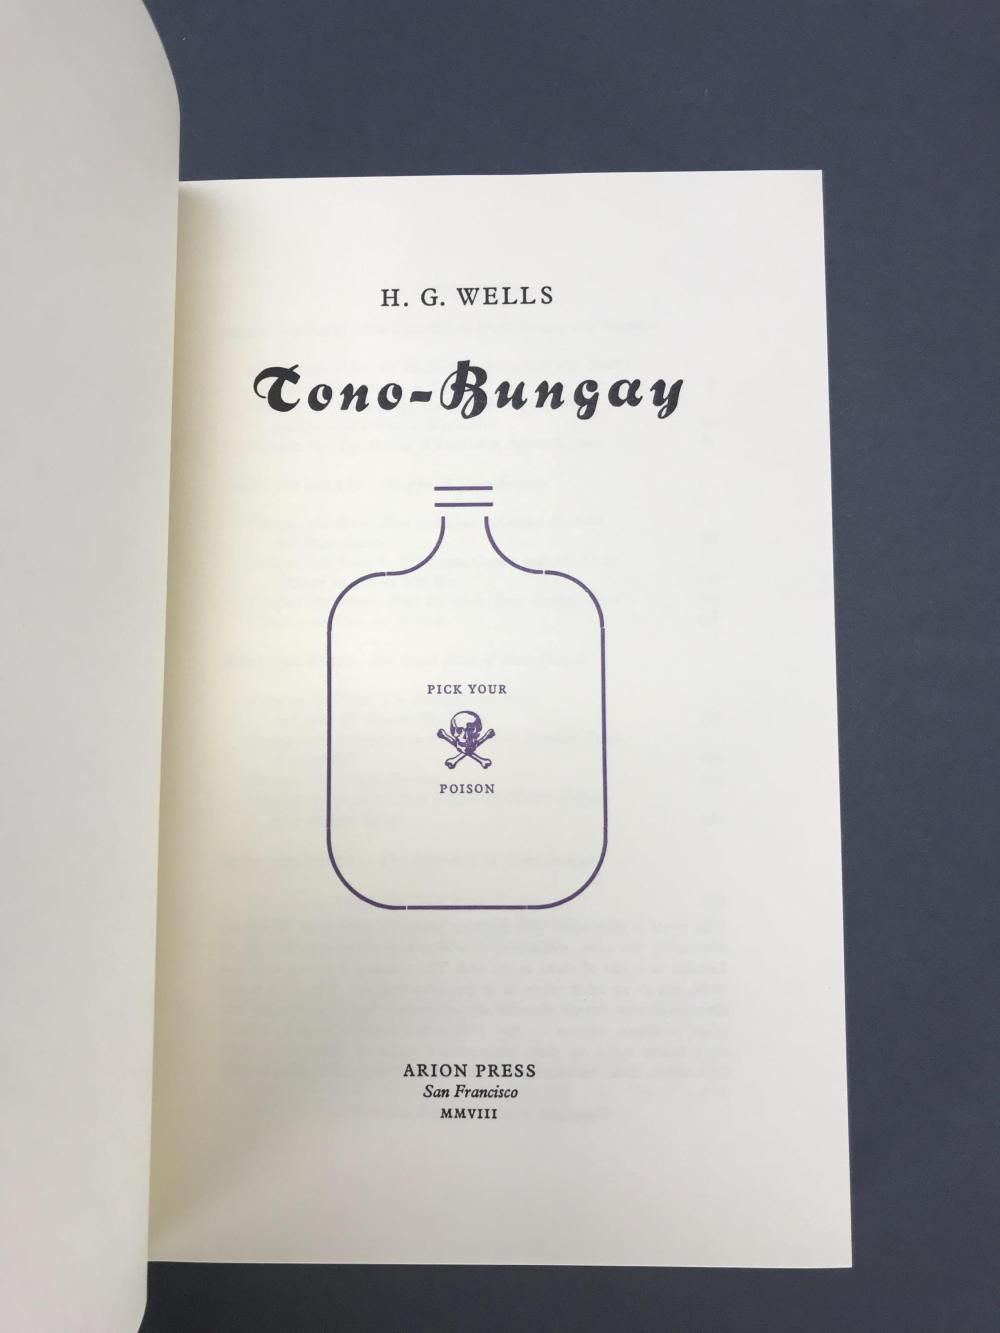 Lot 201: Arion Press. Tono-Bungay. Number 102 of 300.